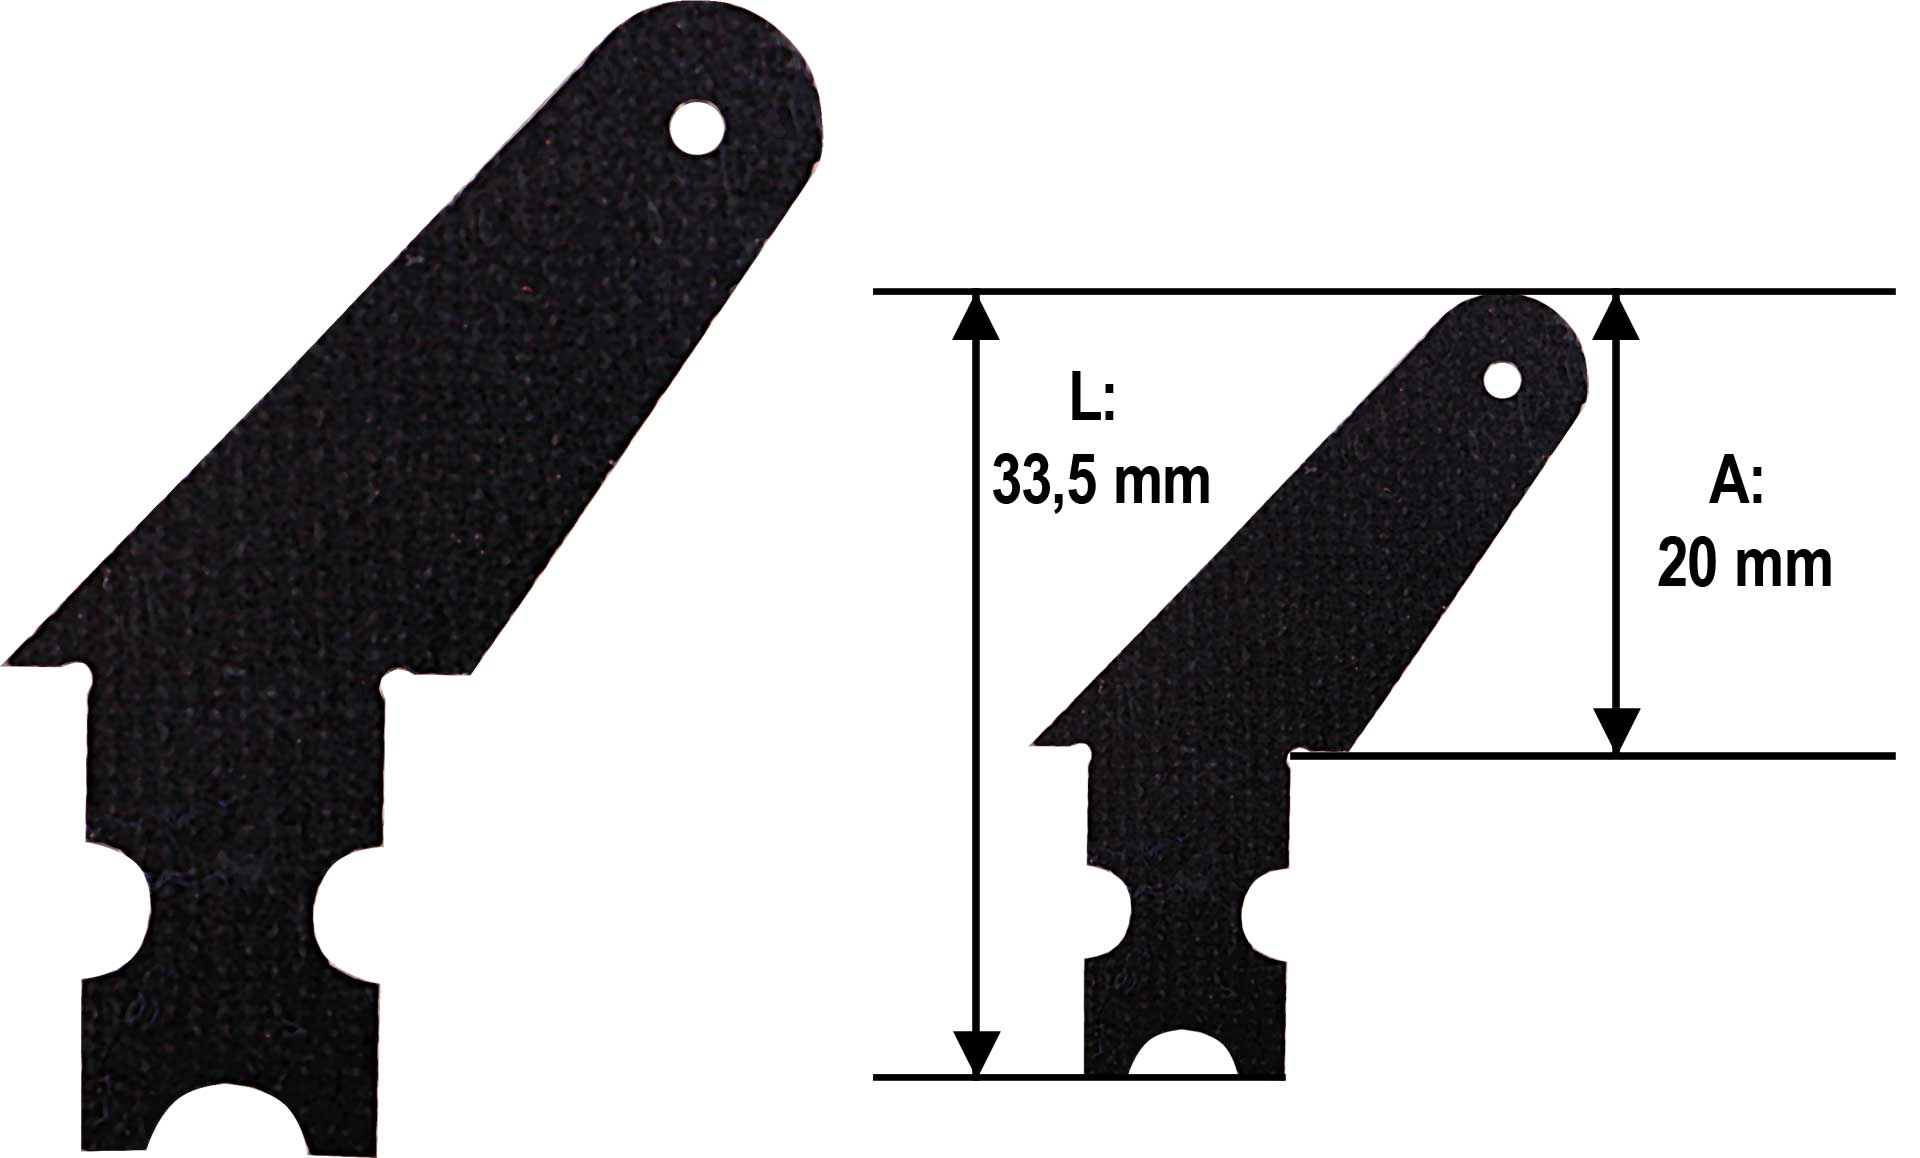 MODELLBAU LINDINGER GFK Ruderhorn 16mm Set 10Stk. 1,5mm GFK schwarz